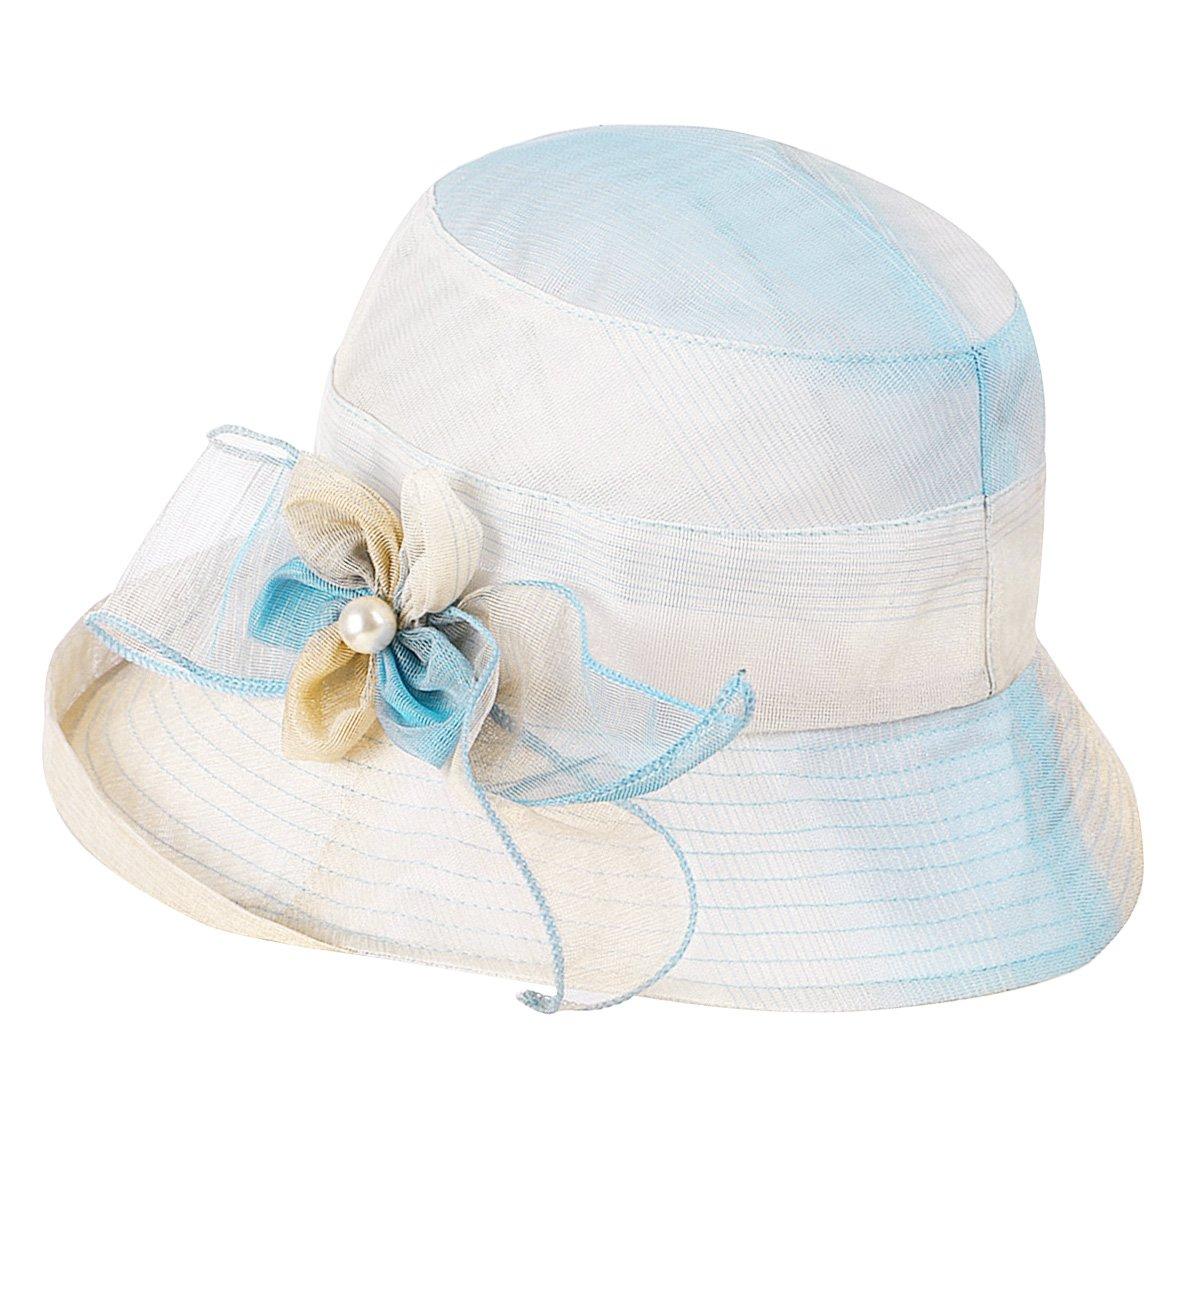 Sumolux Women Derby Church Dress Sun Hats Wide Brim Flounce Cocktail Tea Party Bridal Dress Wedding for Ladies Girls Blue